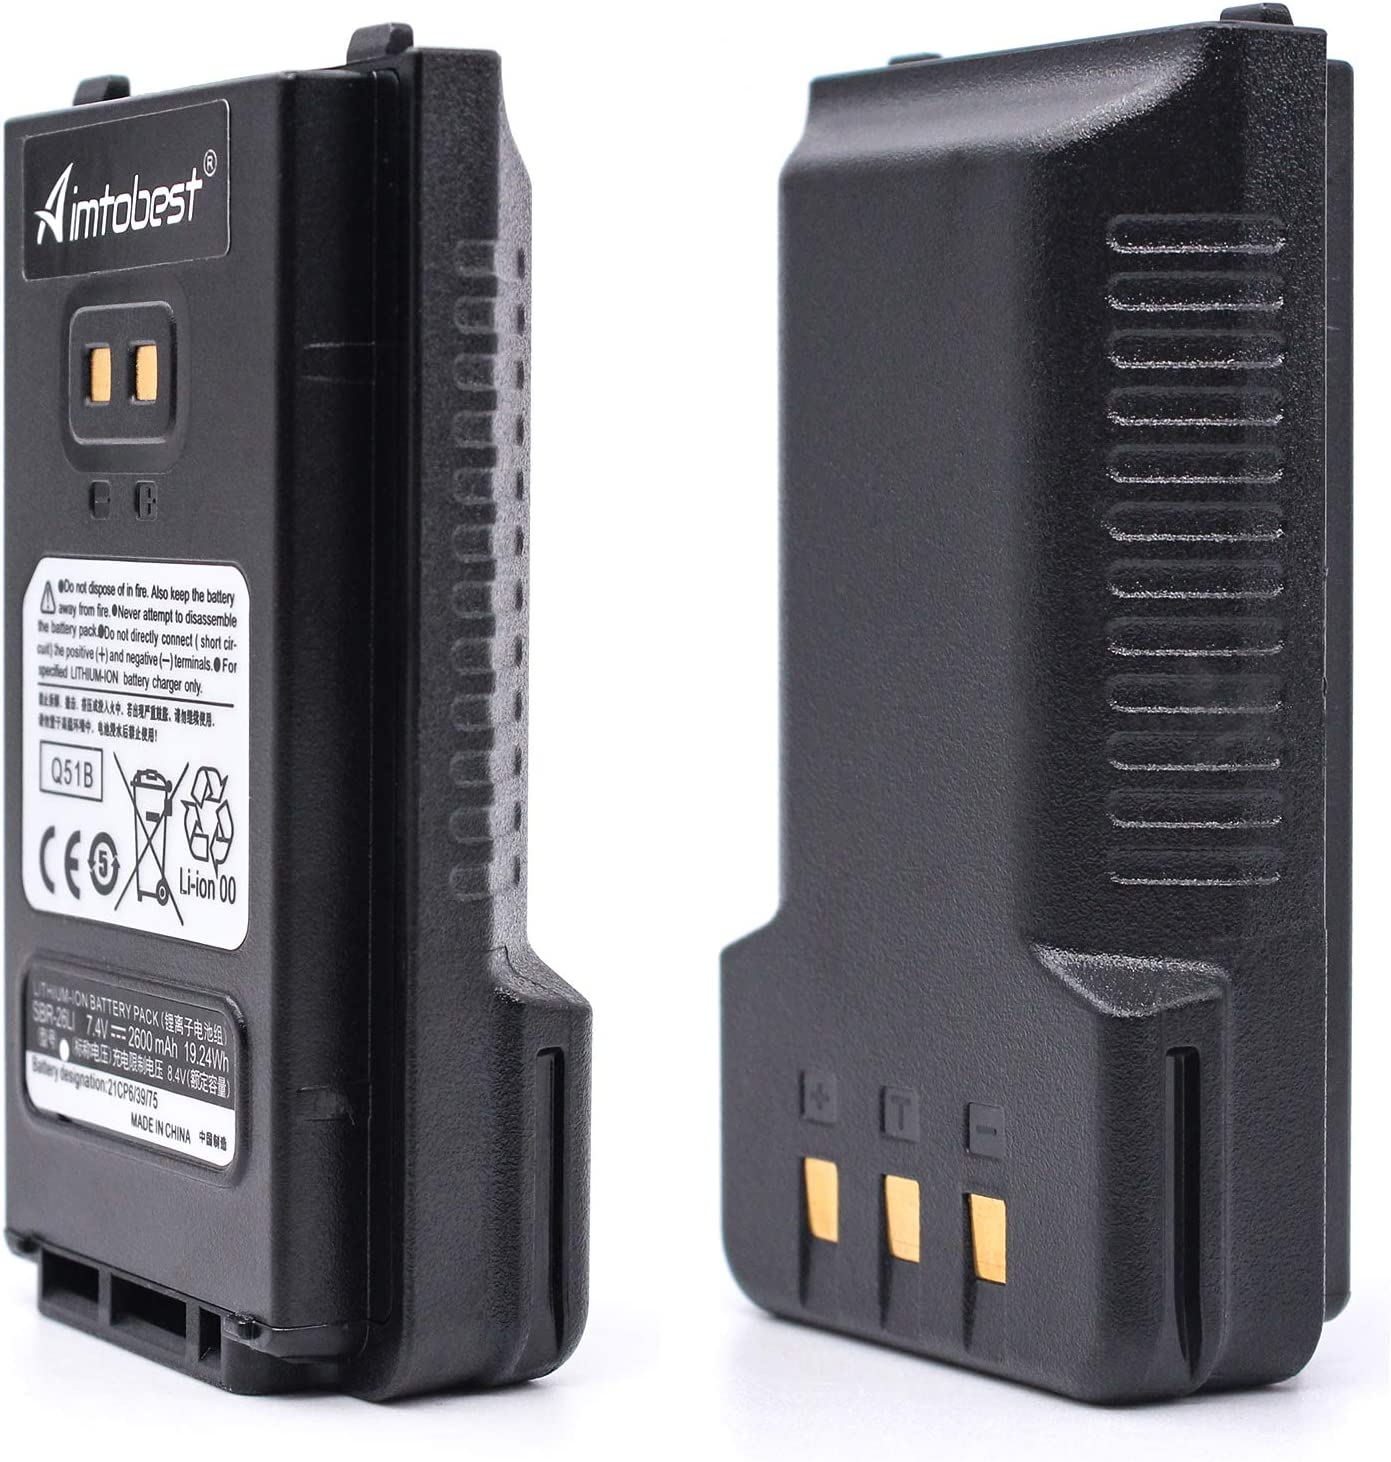 ghdonat.com Electronics Accessories SBR-26LI 2600mAh Li-ion ...